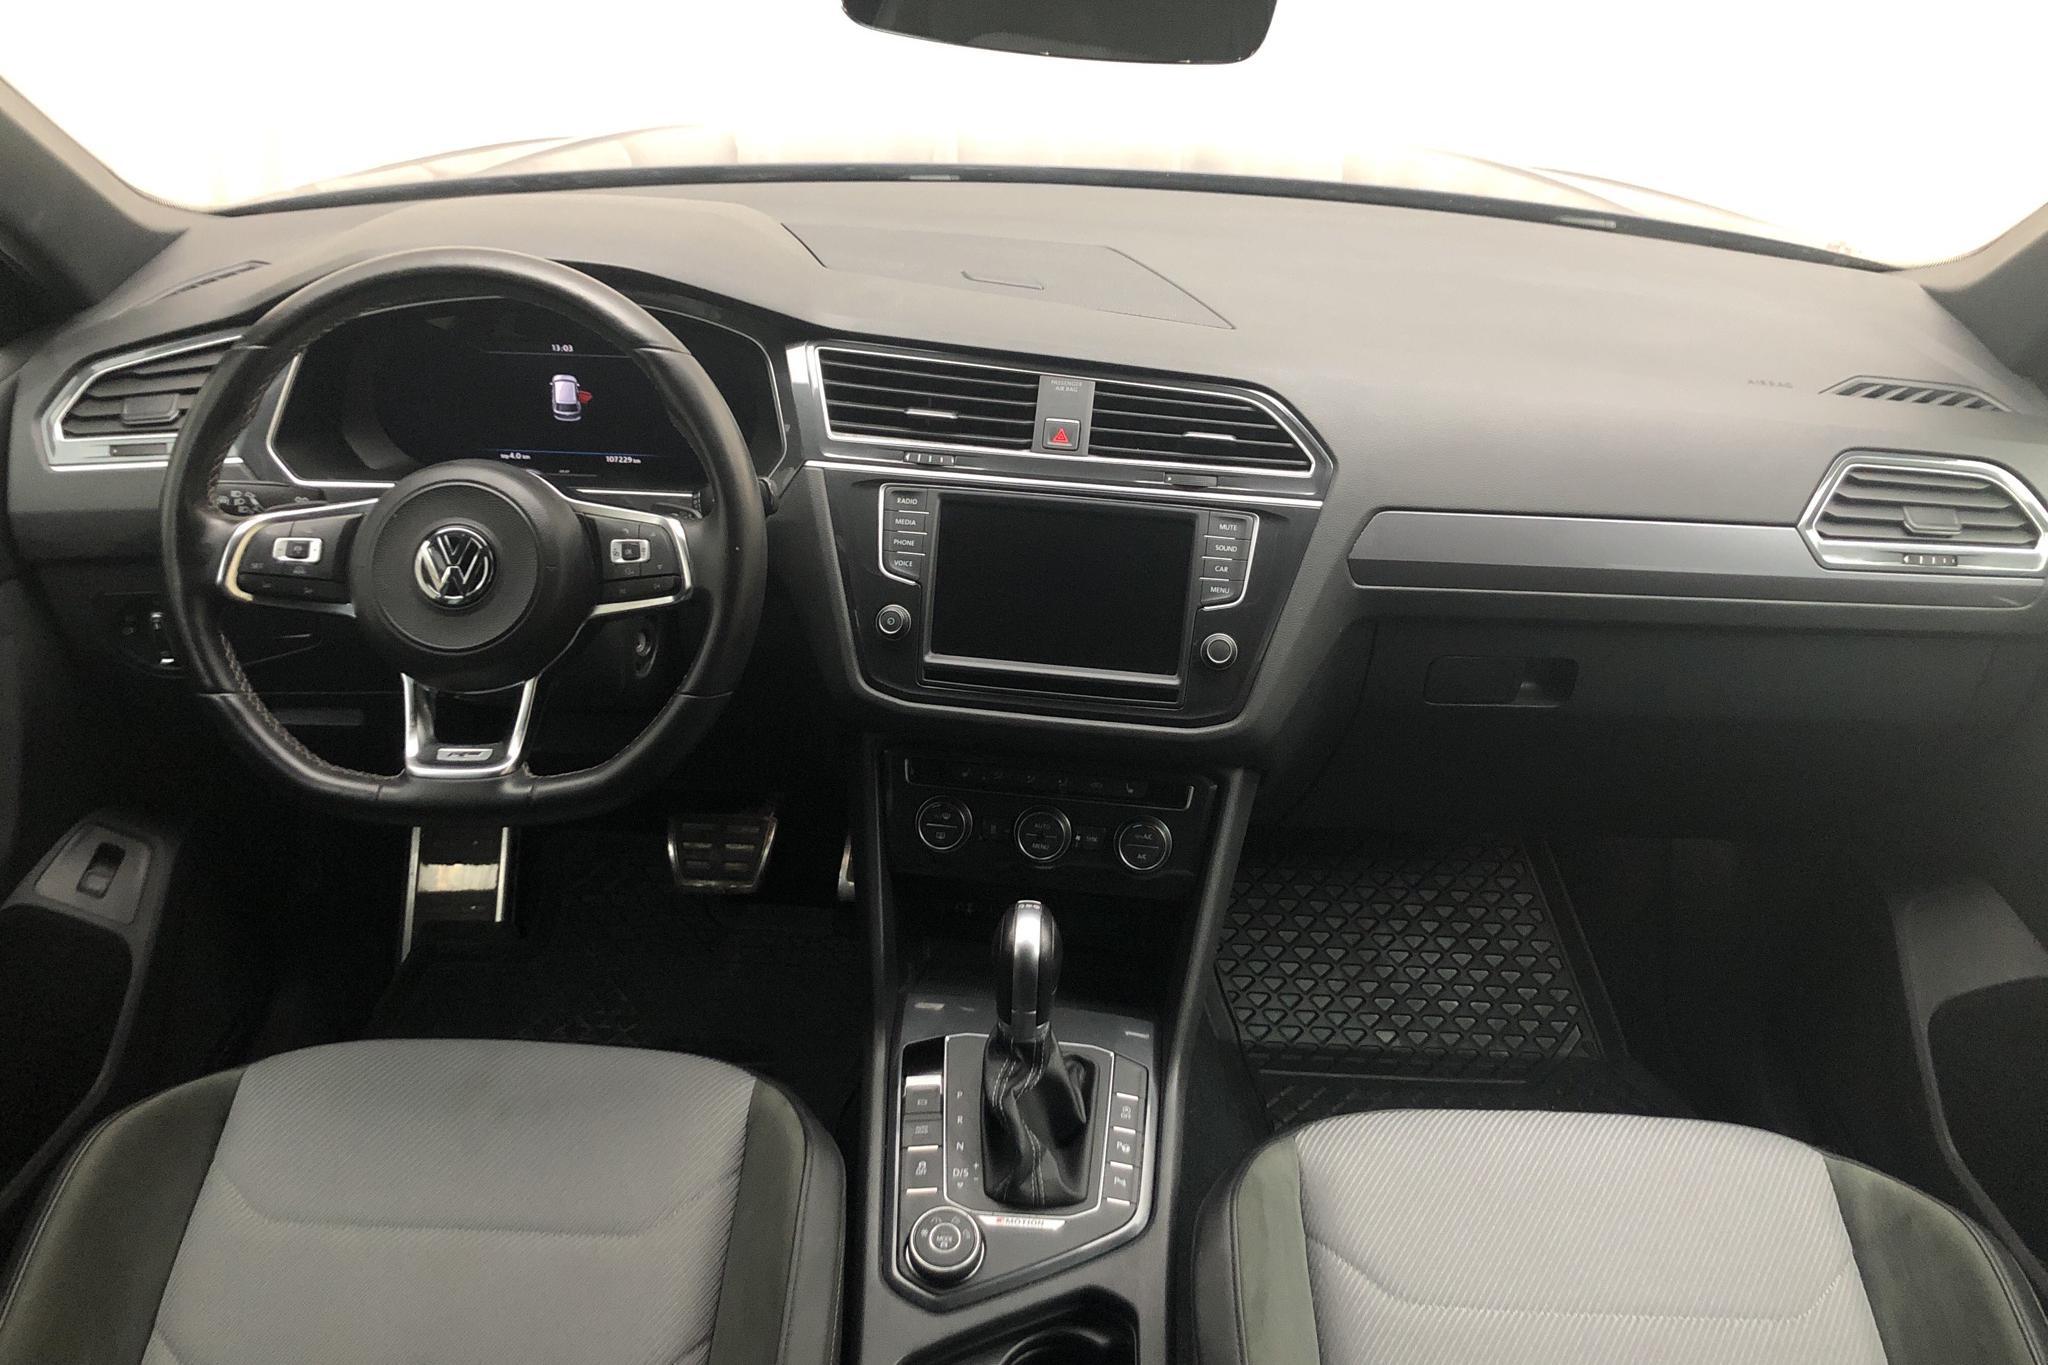 VW Tiguan 2.0 TDI 4MOTION (240hk) - 107 220 km - Automatic - Dark Blue - 2017